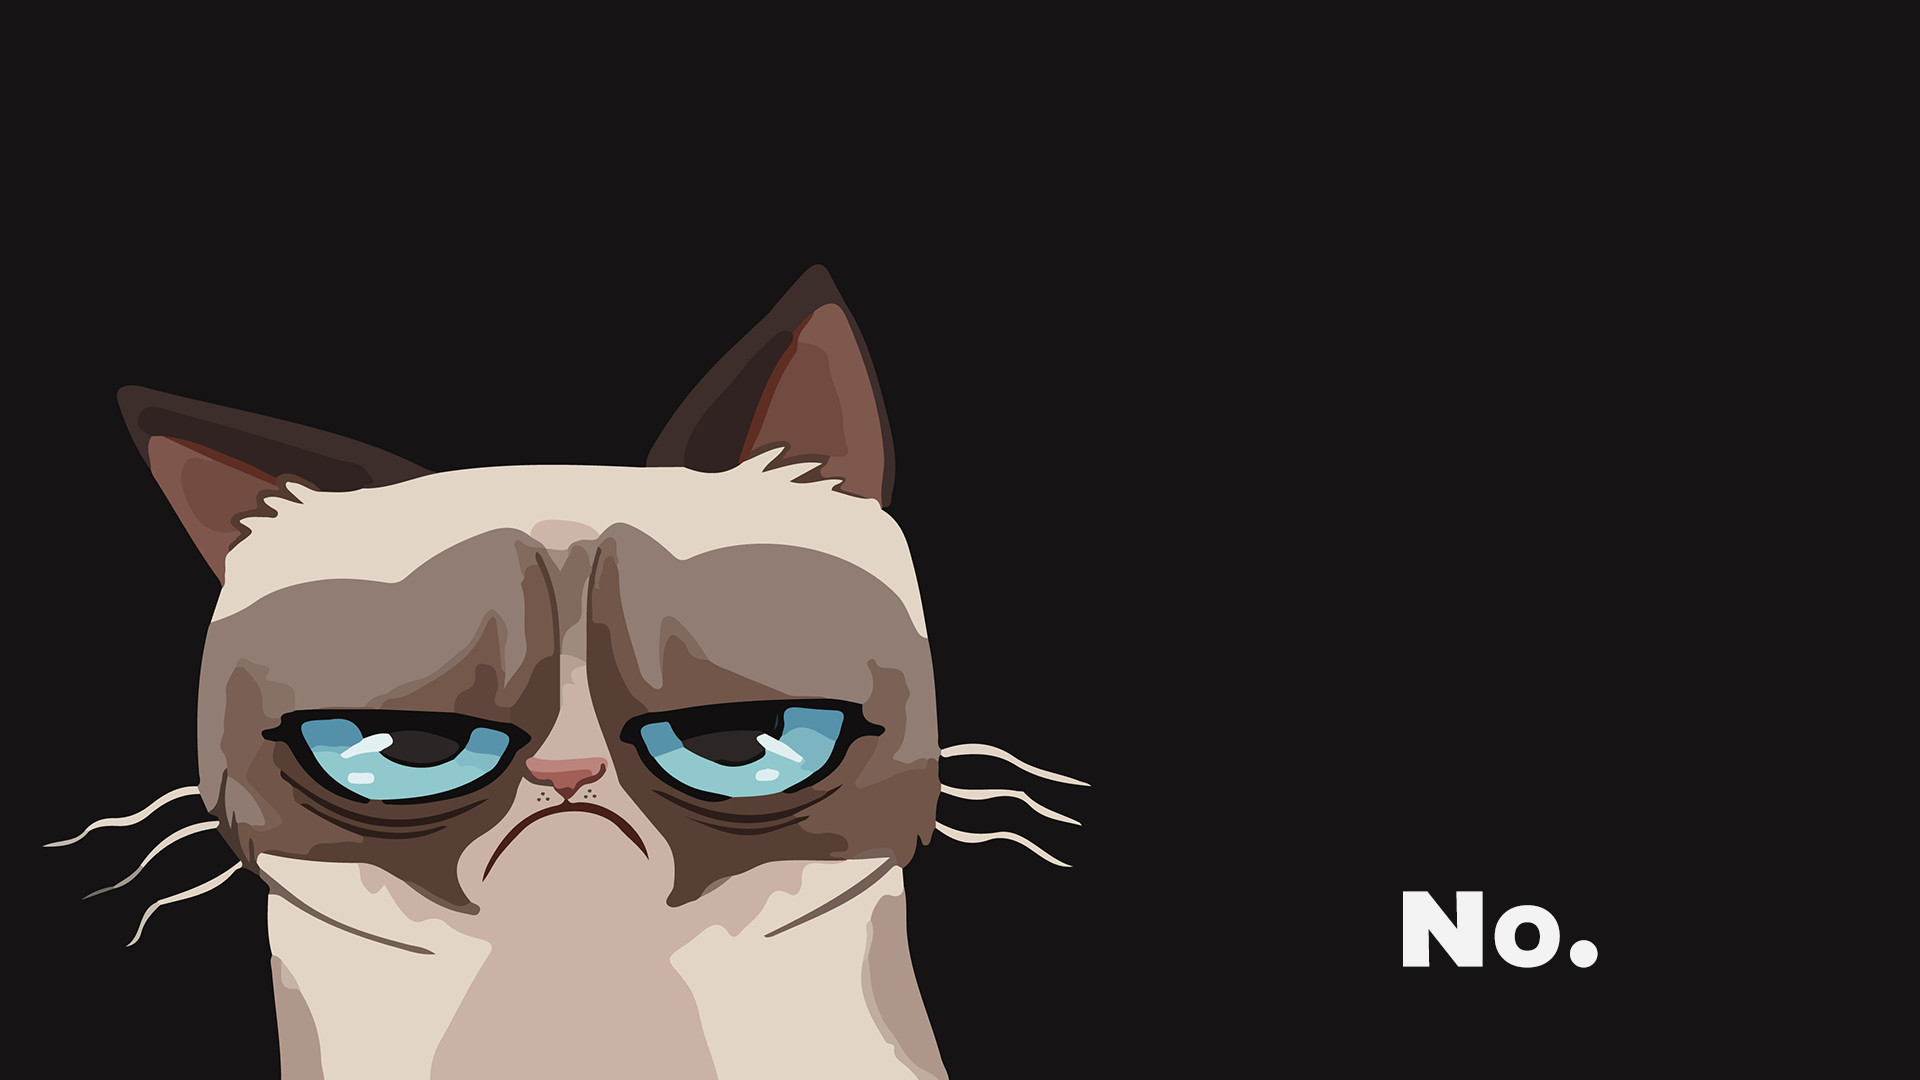 HQ Definition Grumpy Cat Photos 247.87 Kb, NMgnCP